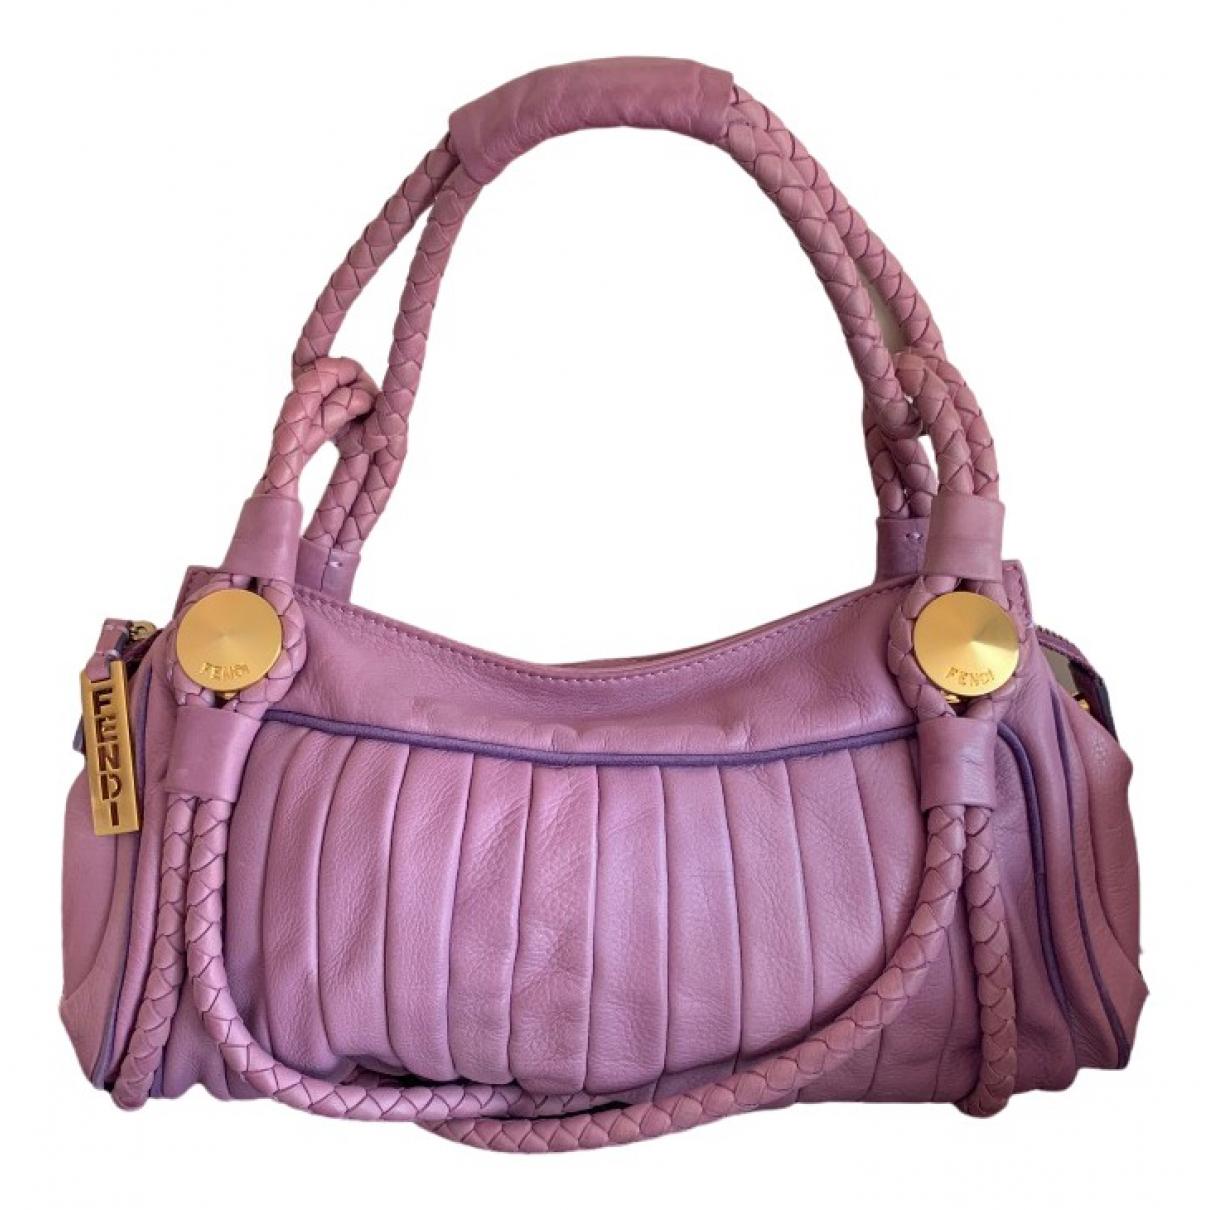 Fendi \N Purple Leather handbag for Women \N